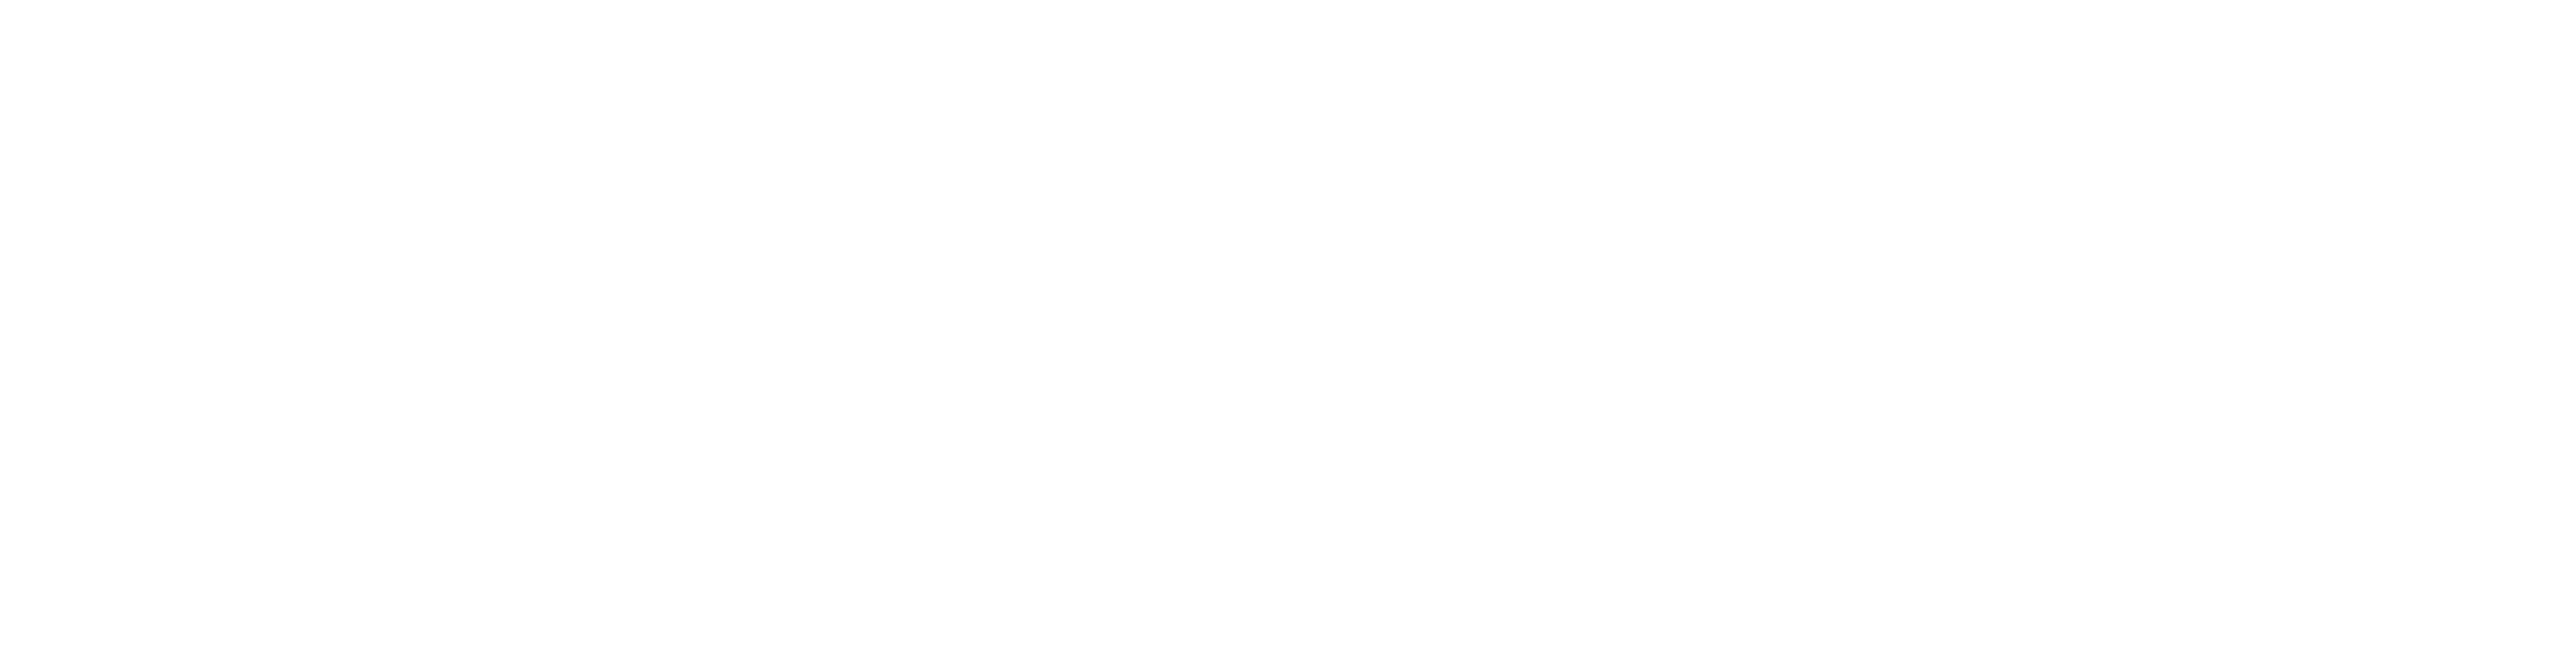 JARBLY – Web Development, Media Conglomerate & Venture Company